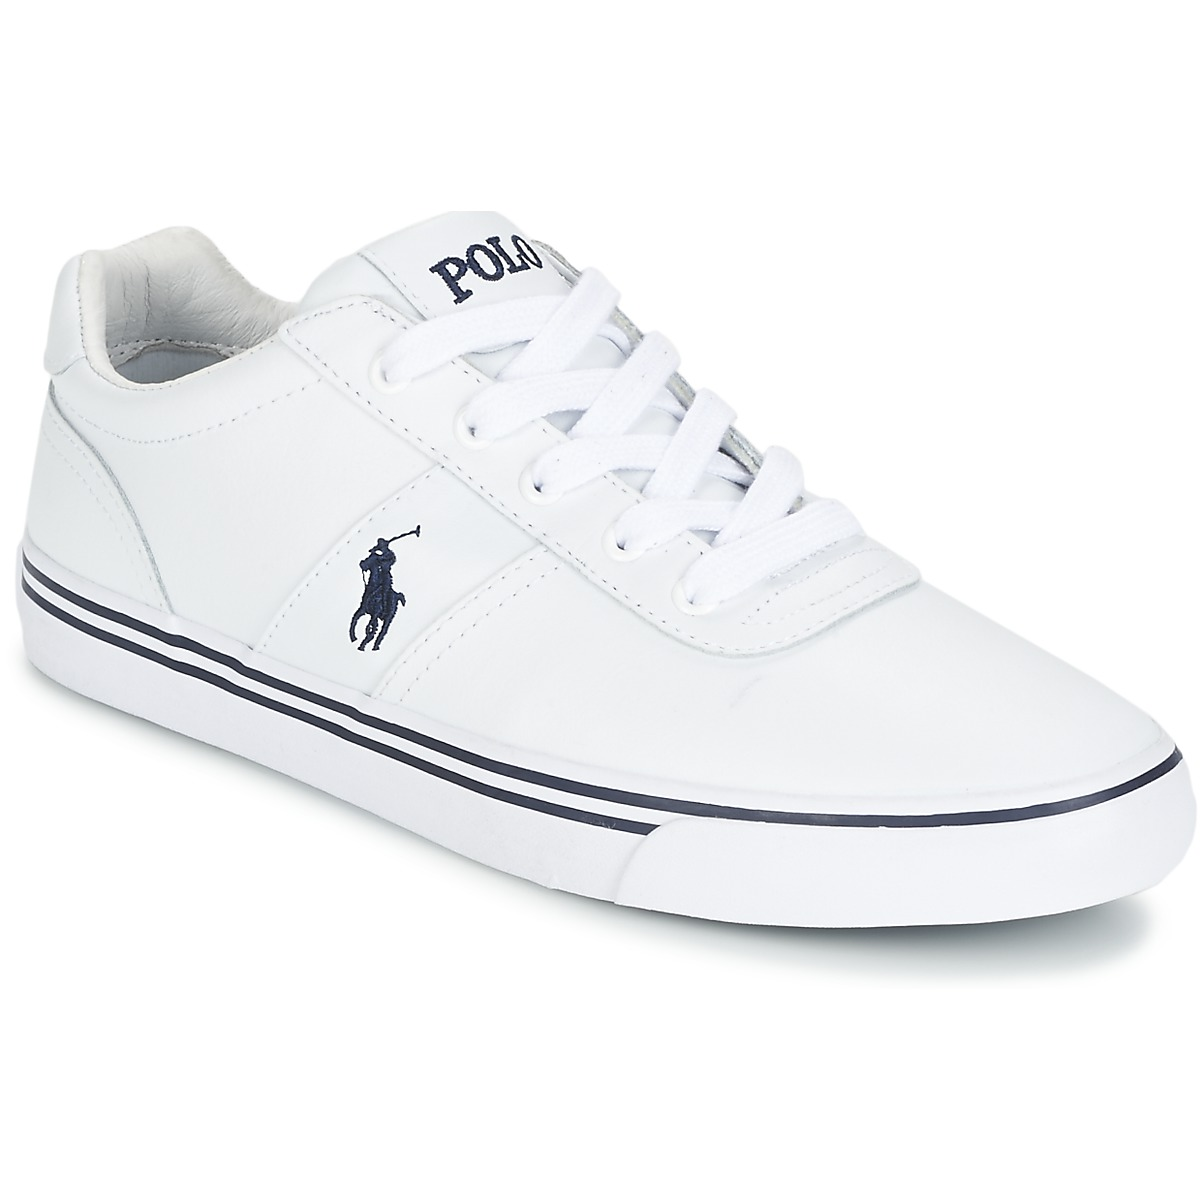 Polo Ralph Lauren HANFORD Weiss - Kostenloser Versand bei Spartoode ! - Schuhe Sneaker Low Herren 79,19 €